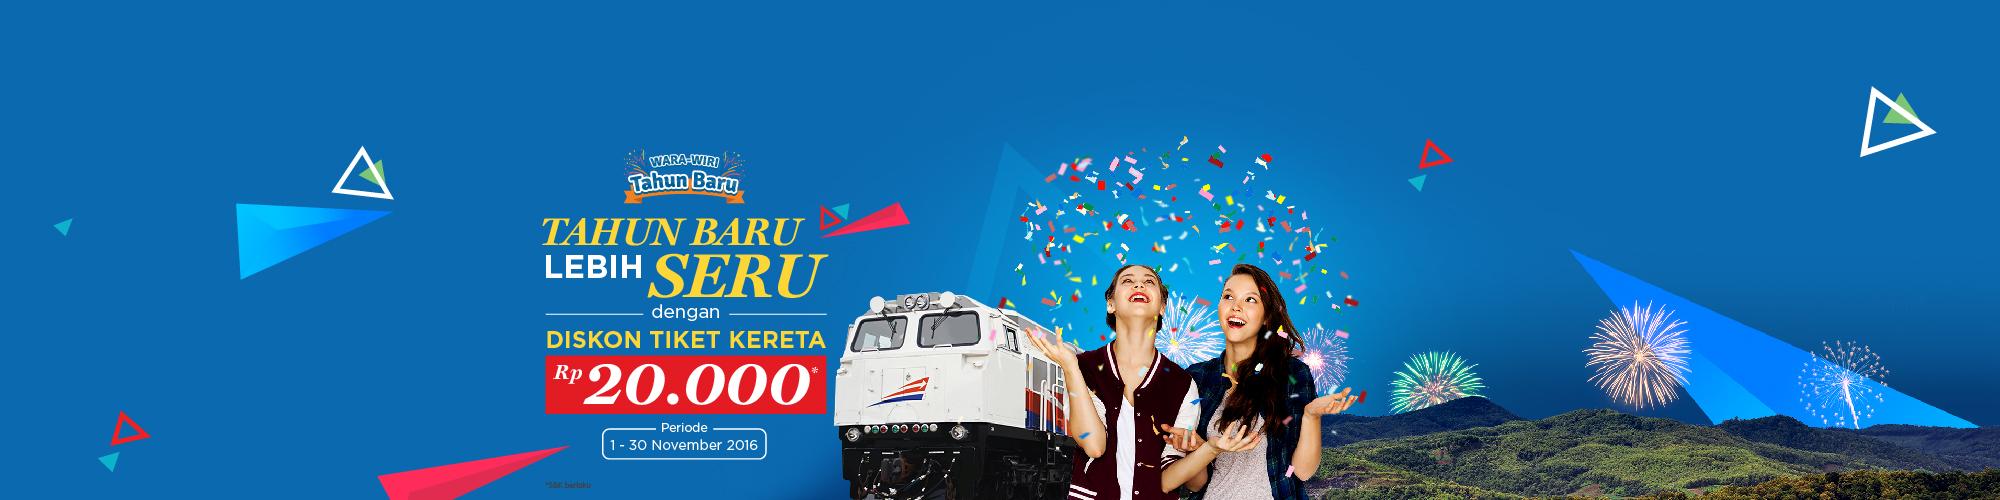 Wara-Wiri Merry happy! Diskon Train Desember